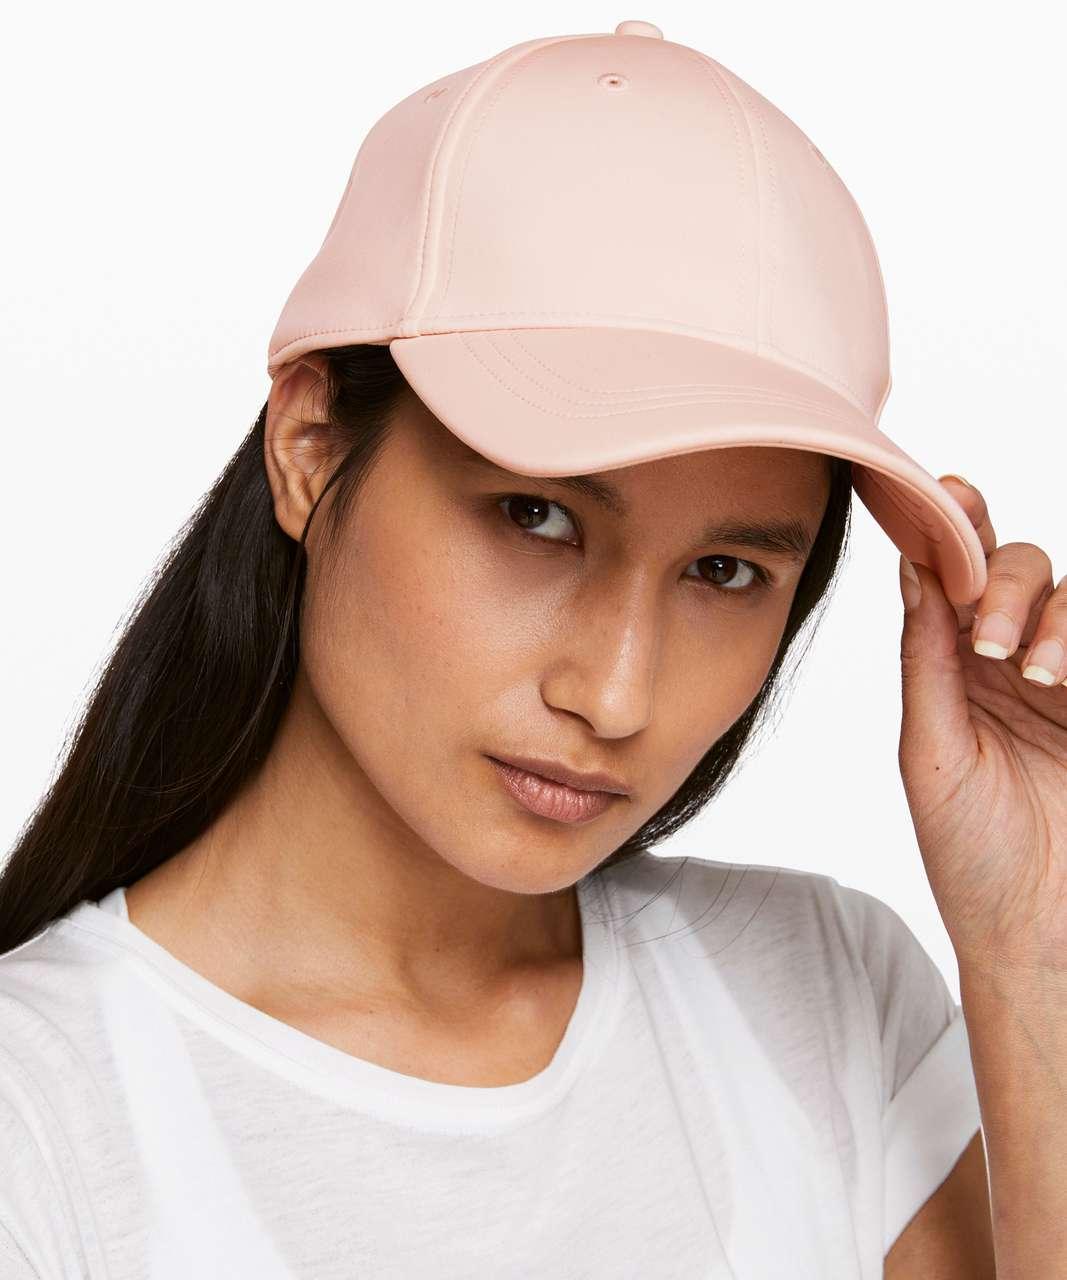 Lululemon Baller Hat - Butter Pink